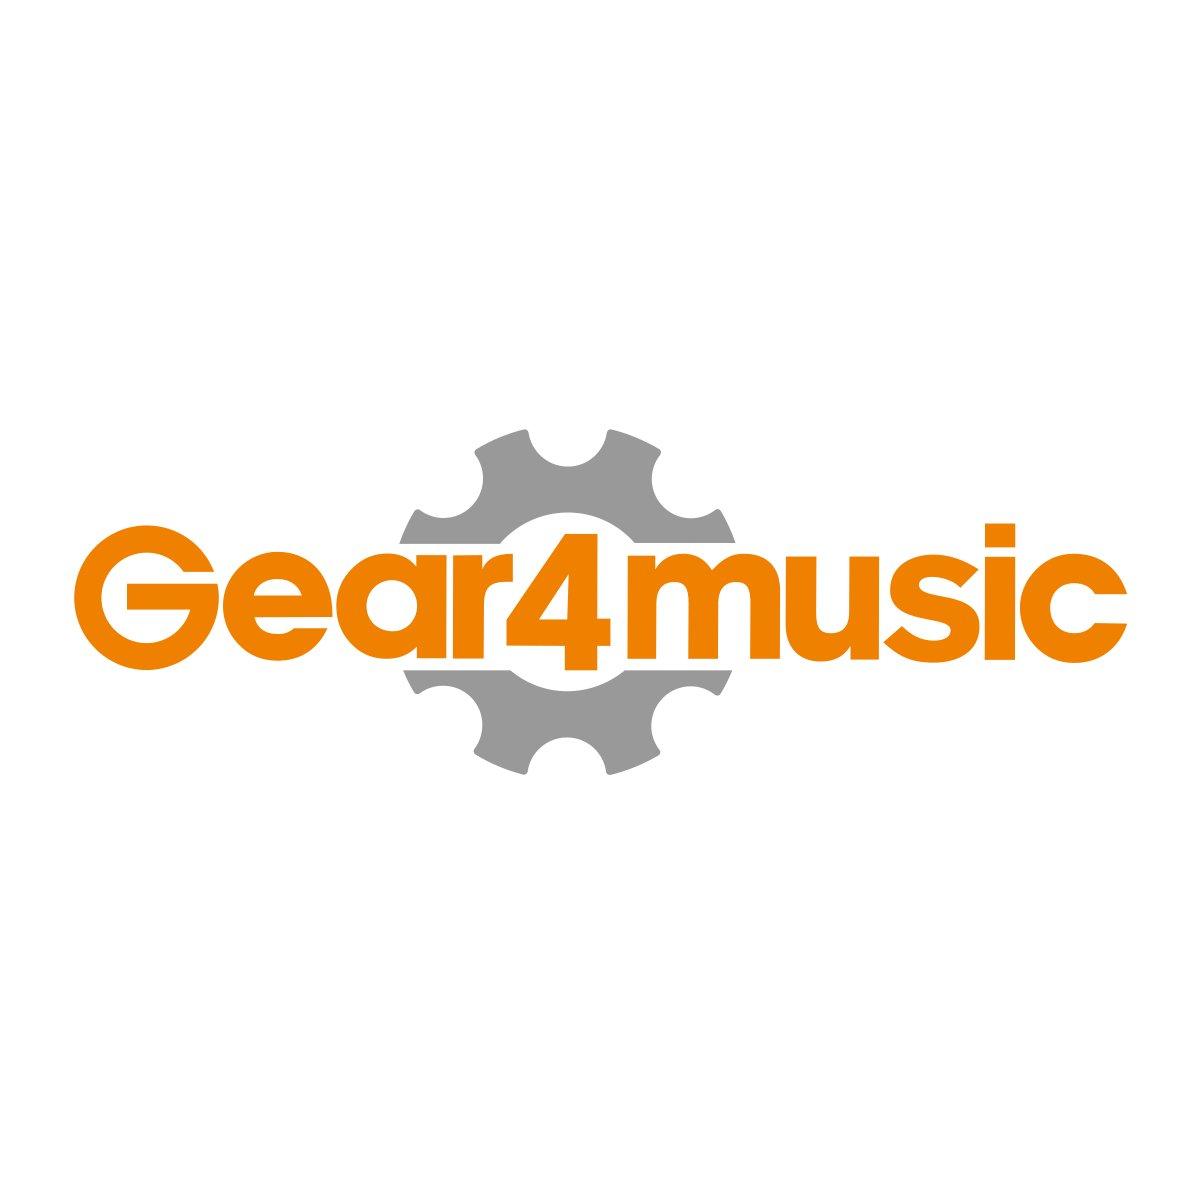 SDP-2 Stage Piano van Gear4music + Standaard, Pedaal en Hoofdtelefoon, Zwart